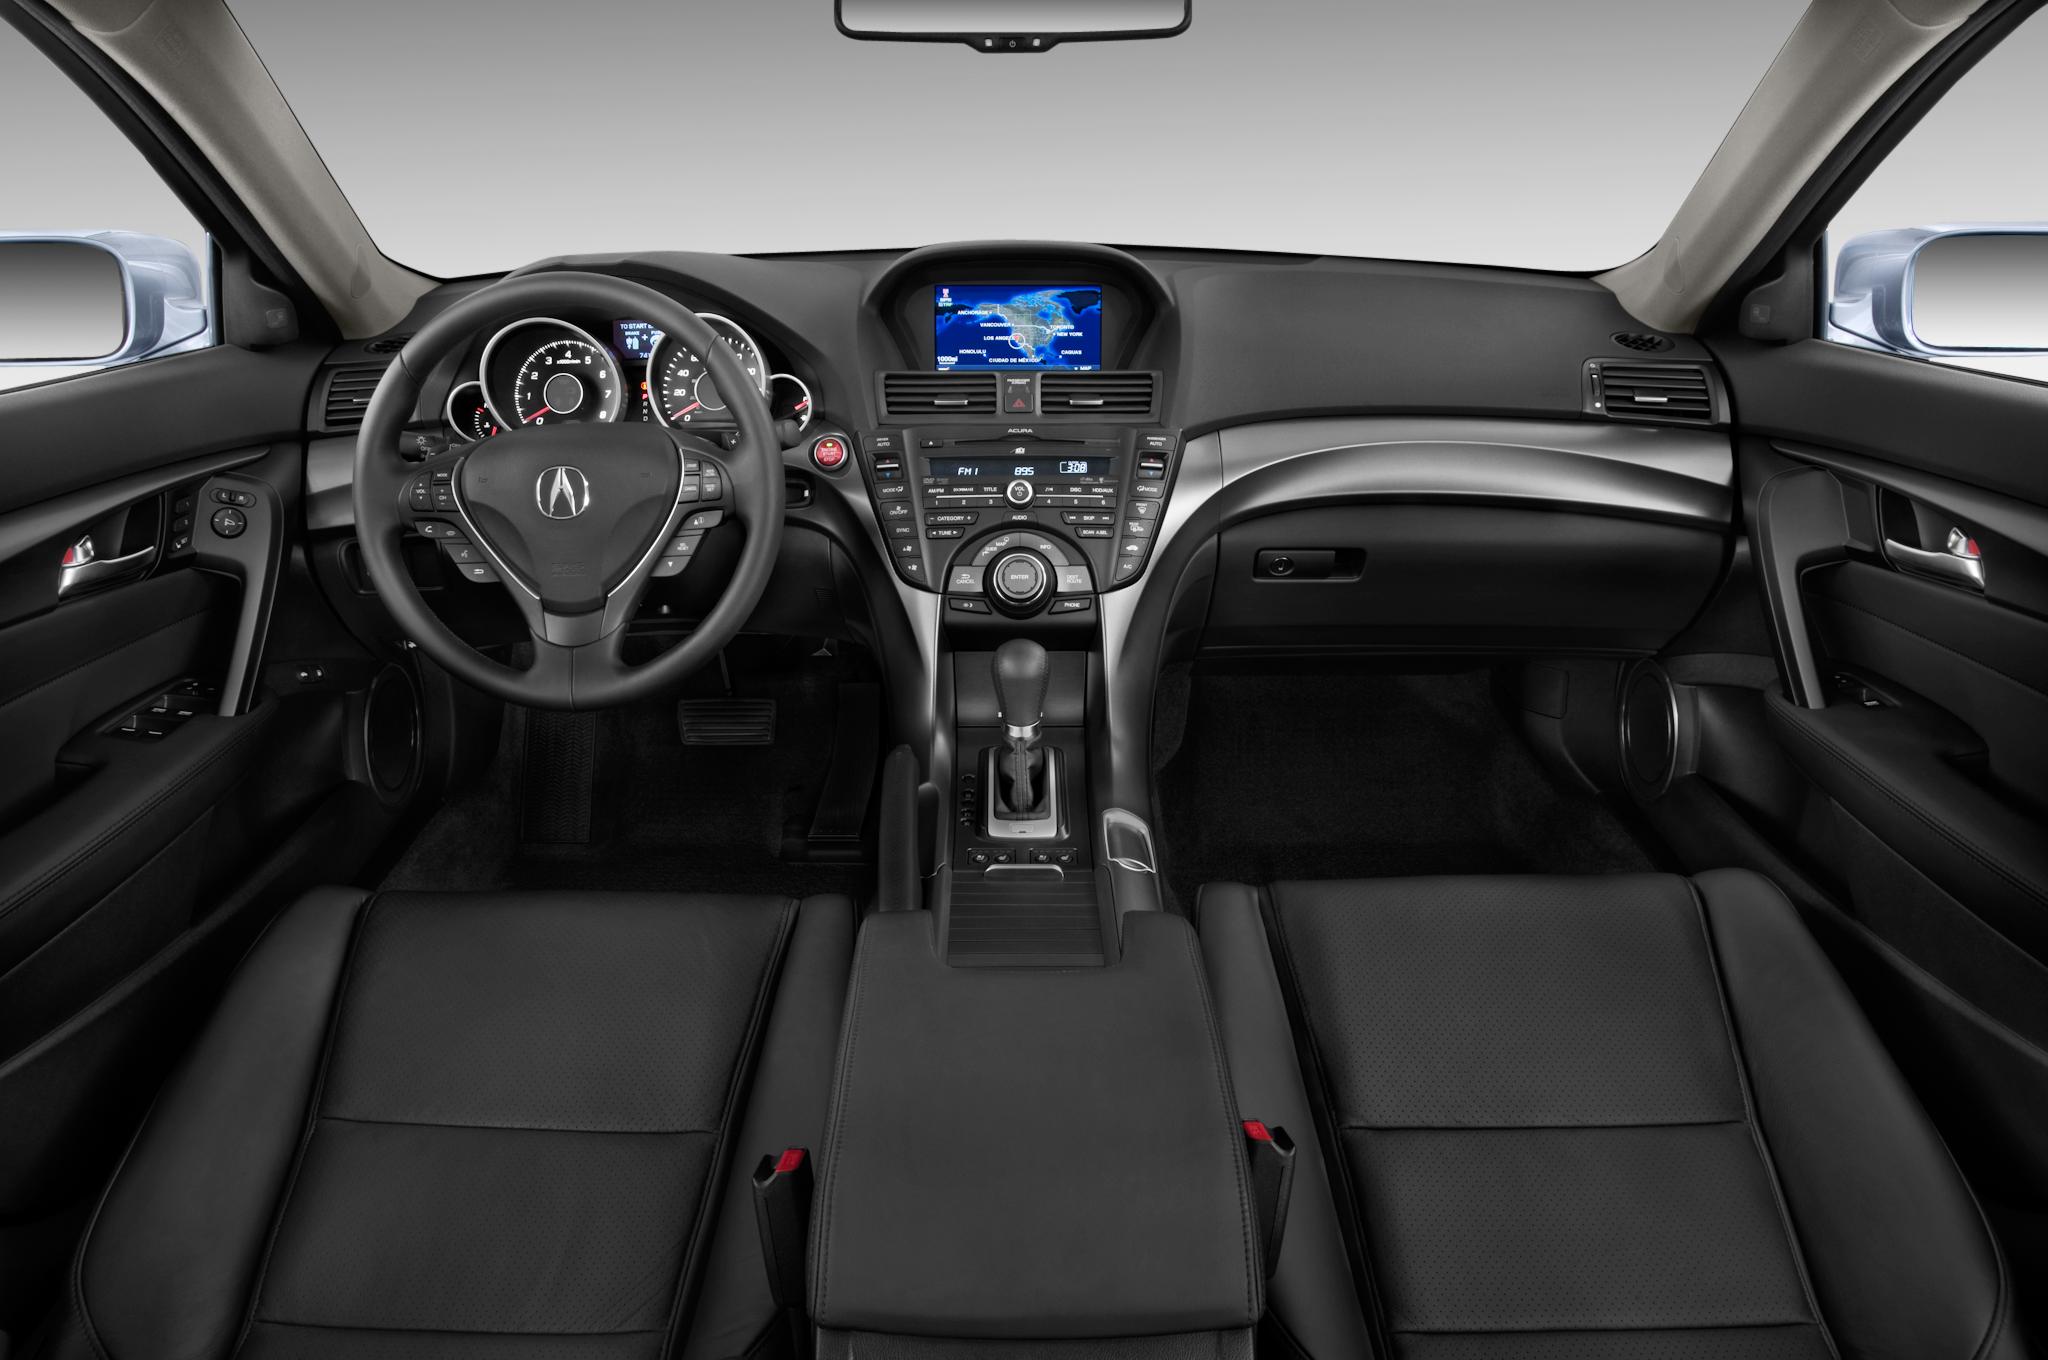 2005 acura rl dash cover manual ebook array acura introduces 2013 tl special edition rh automobilemag com fandeluxe Choice Image